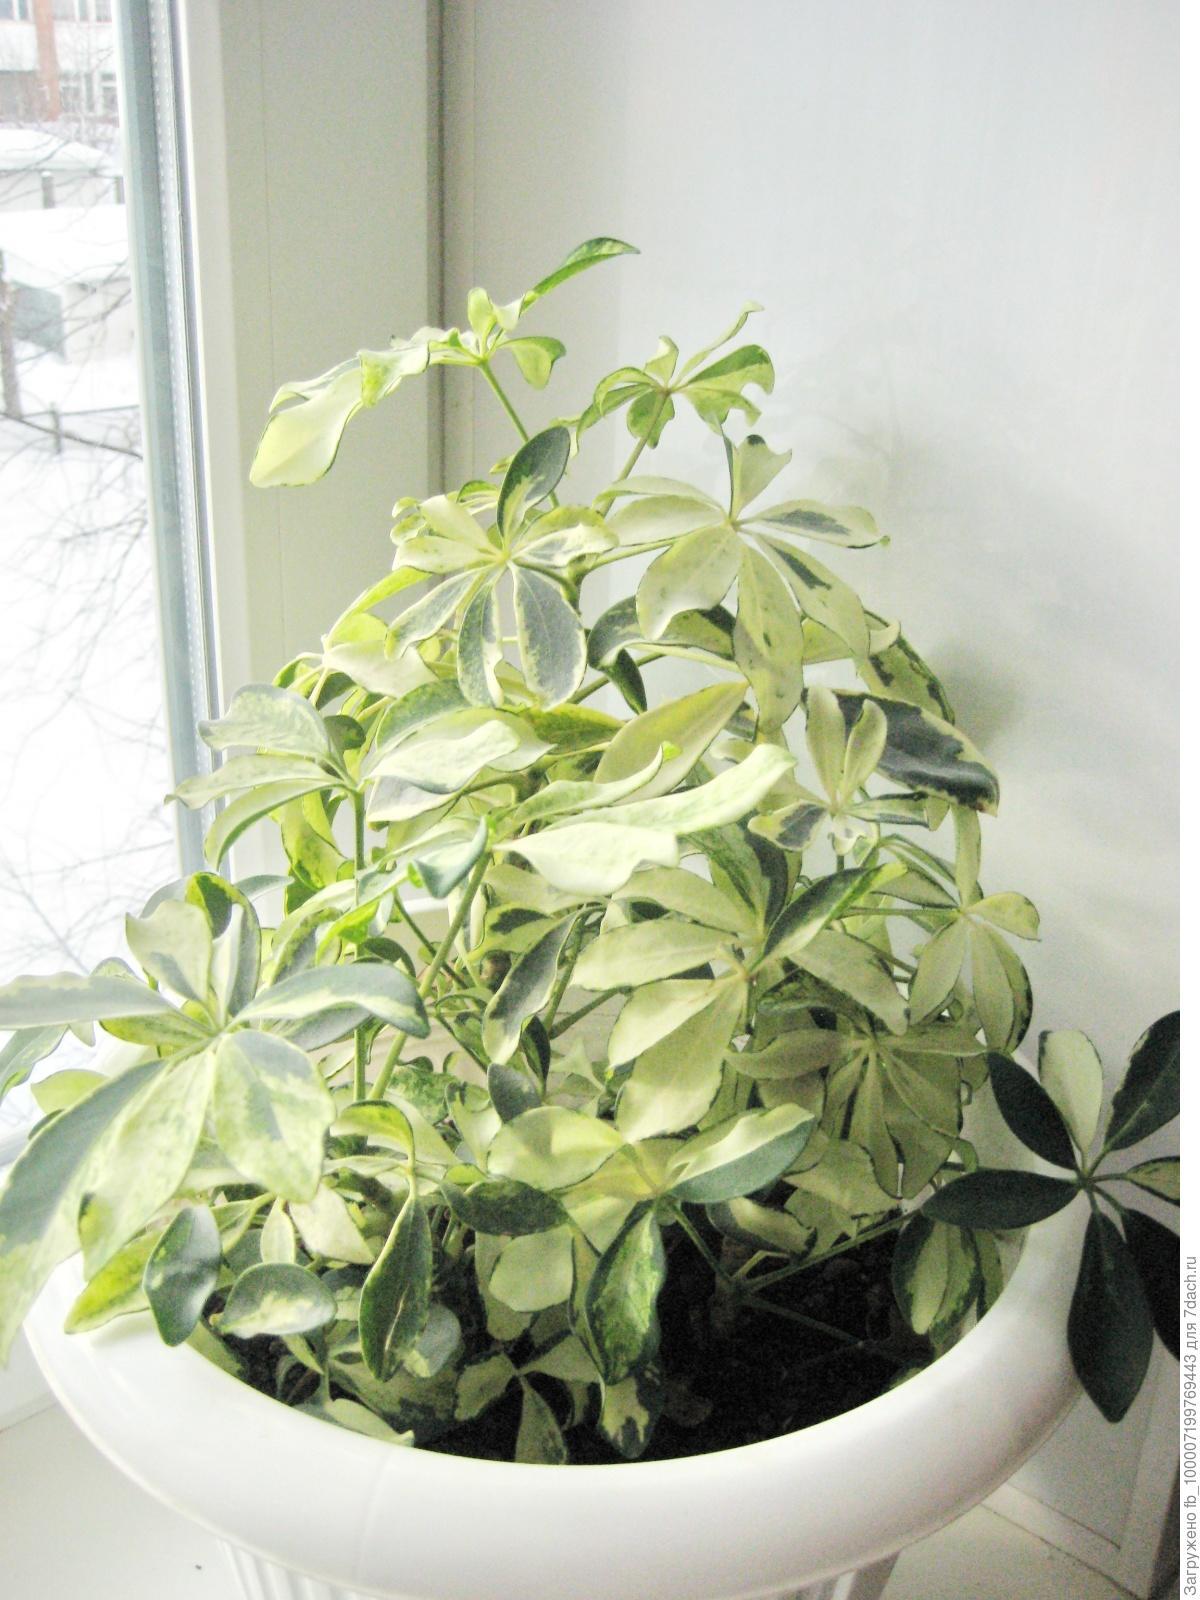 Шефлера цветок уход в домашних условиях пересадка и 51